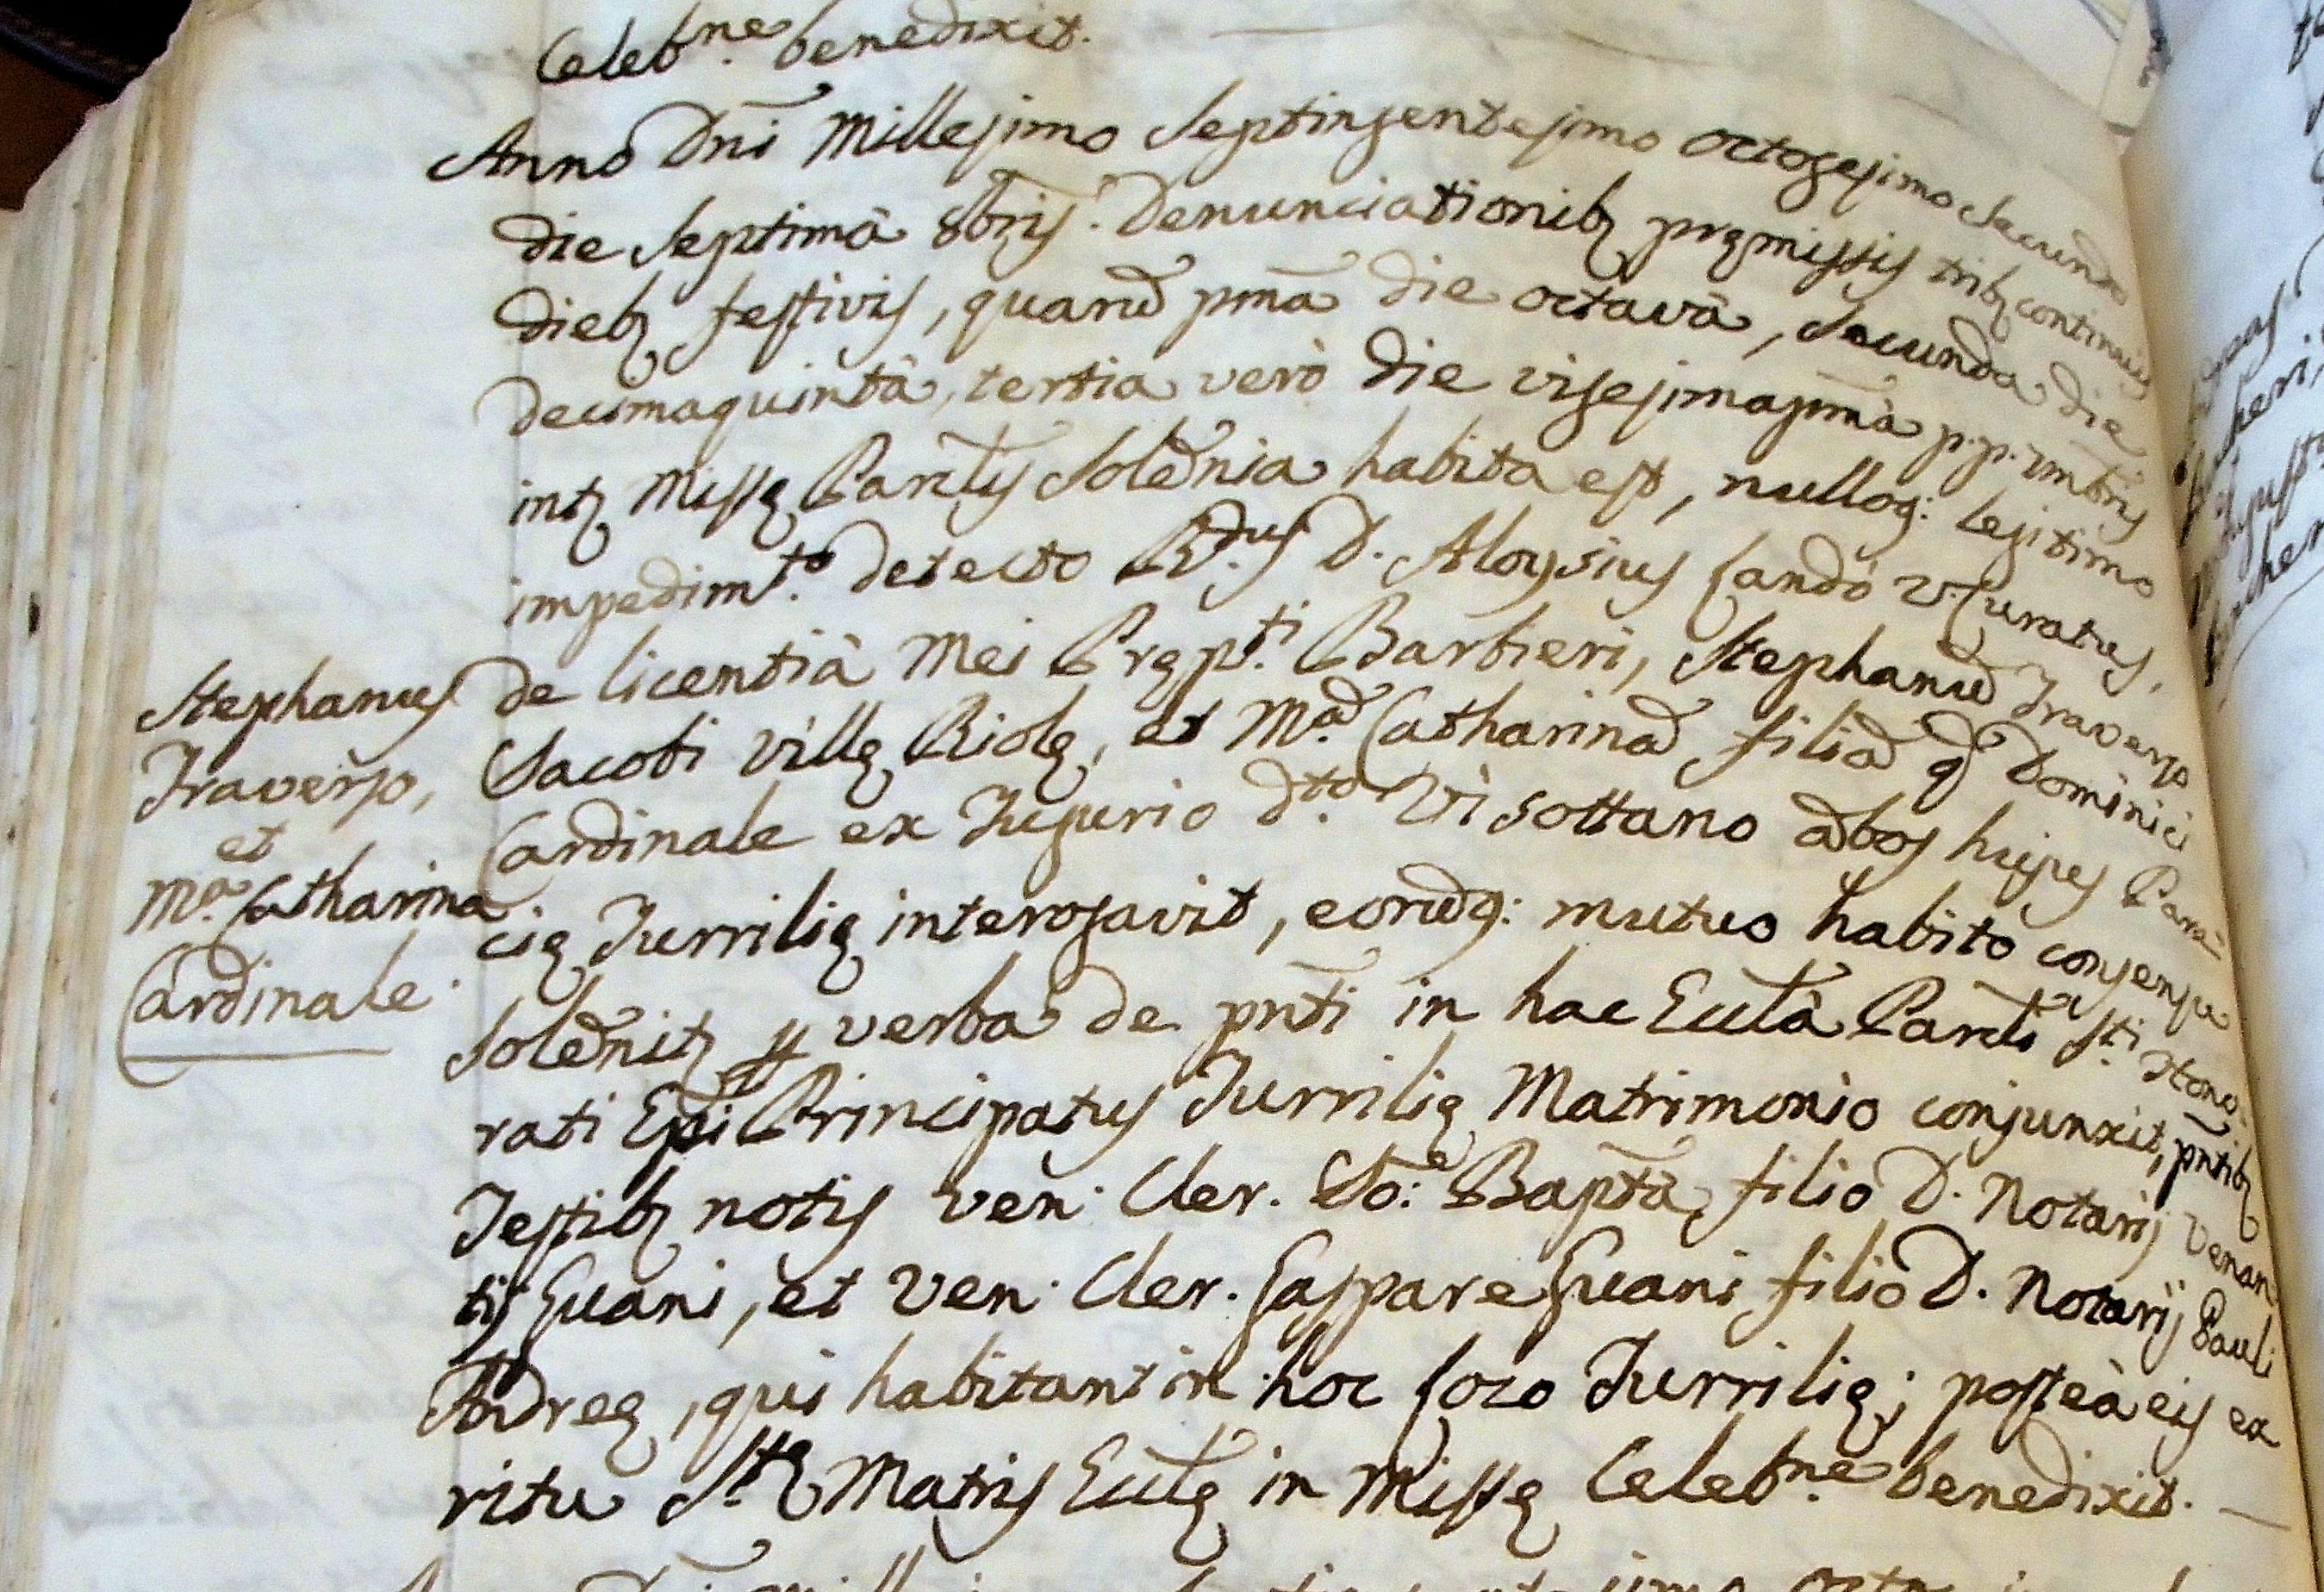 Research your Family History | My Italian Family | Family